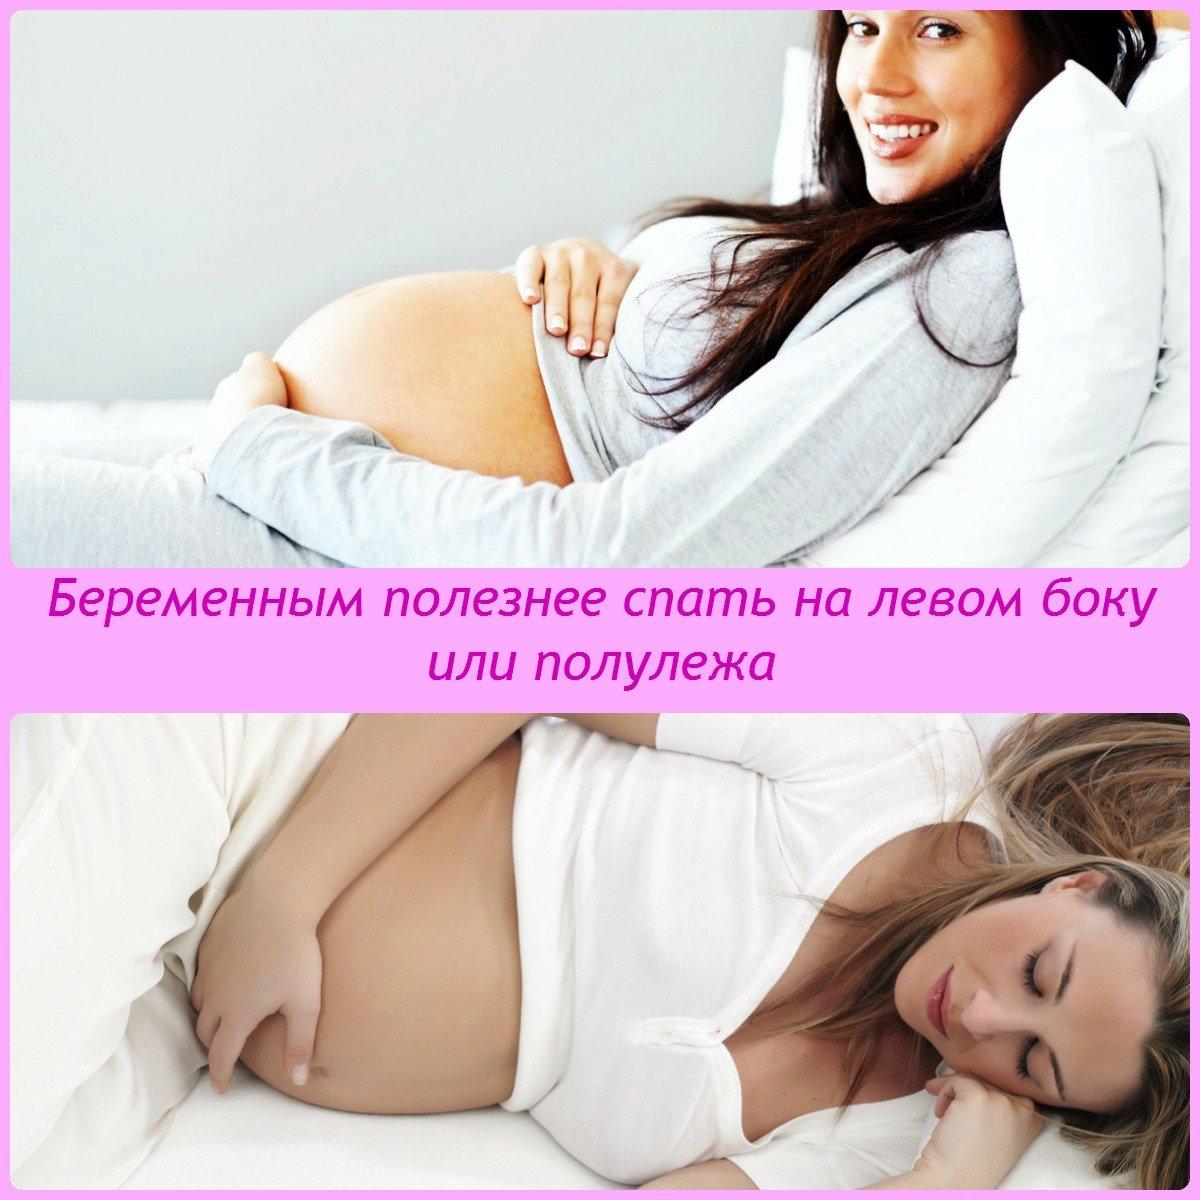 Фото секса при беременности 24 фотография